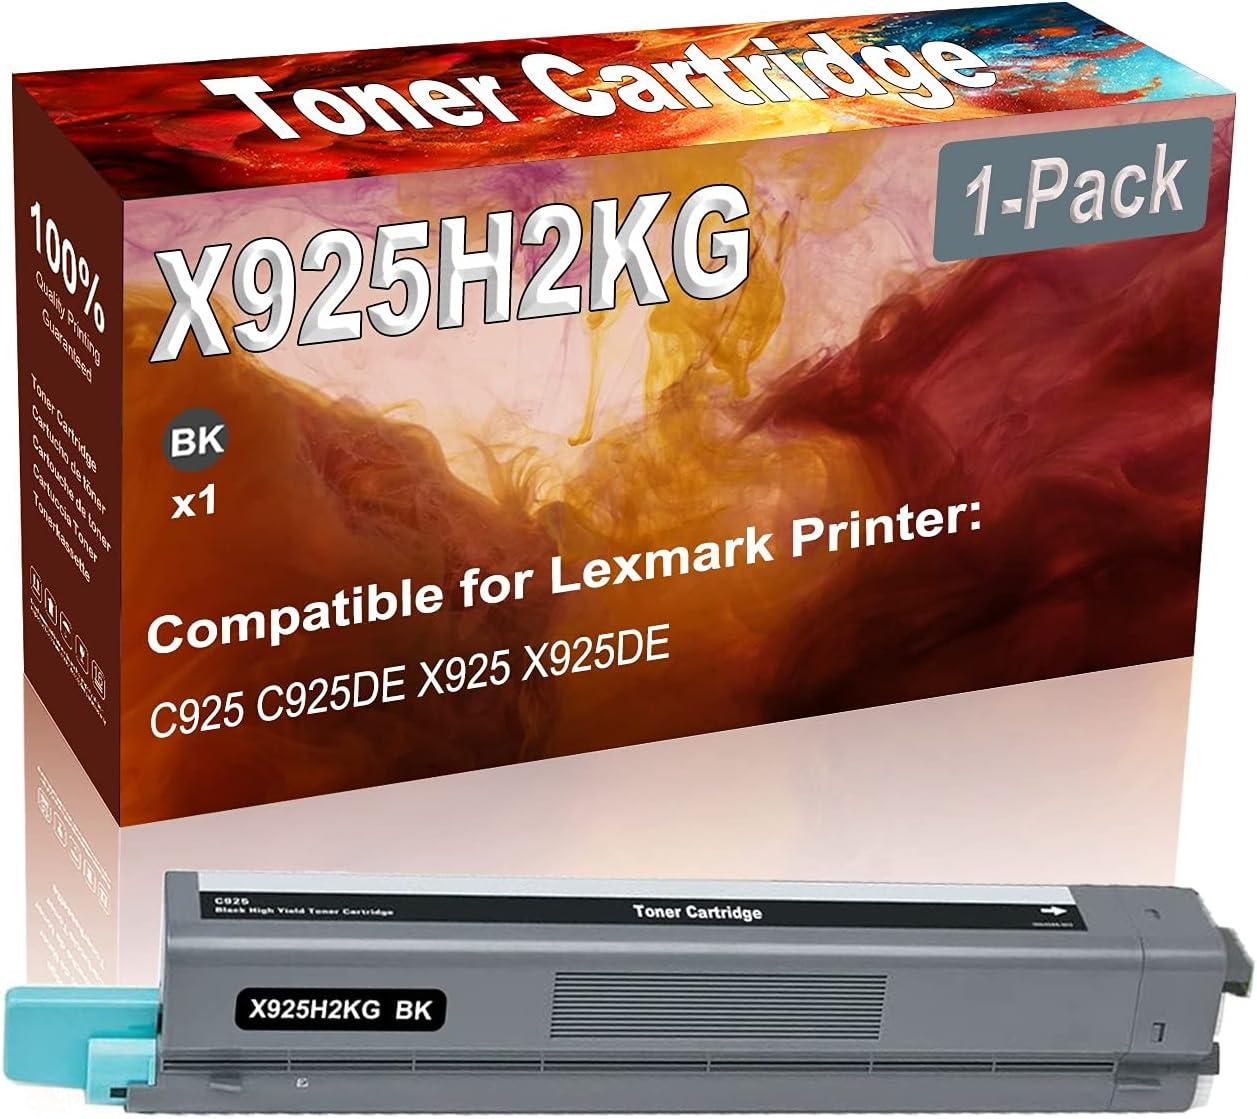 1-Pack (Black) Compatible C925 C925DE X925 X925DE Laser Toner Cartridge (High Capacity) Replacement for Lexmark X925H2KG Printer Toner Cartridge